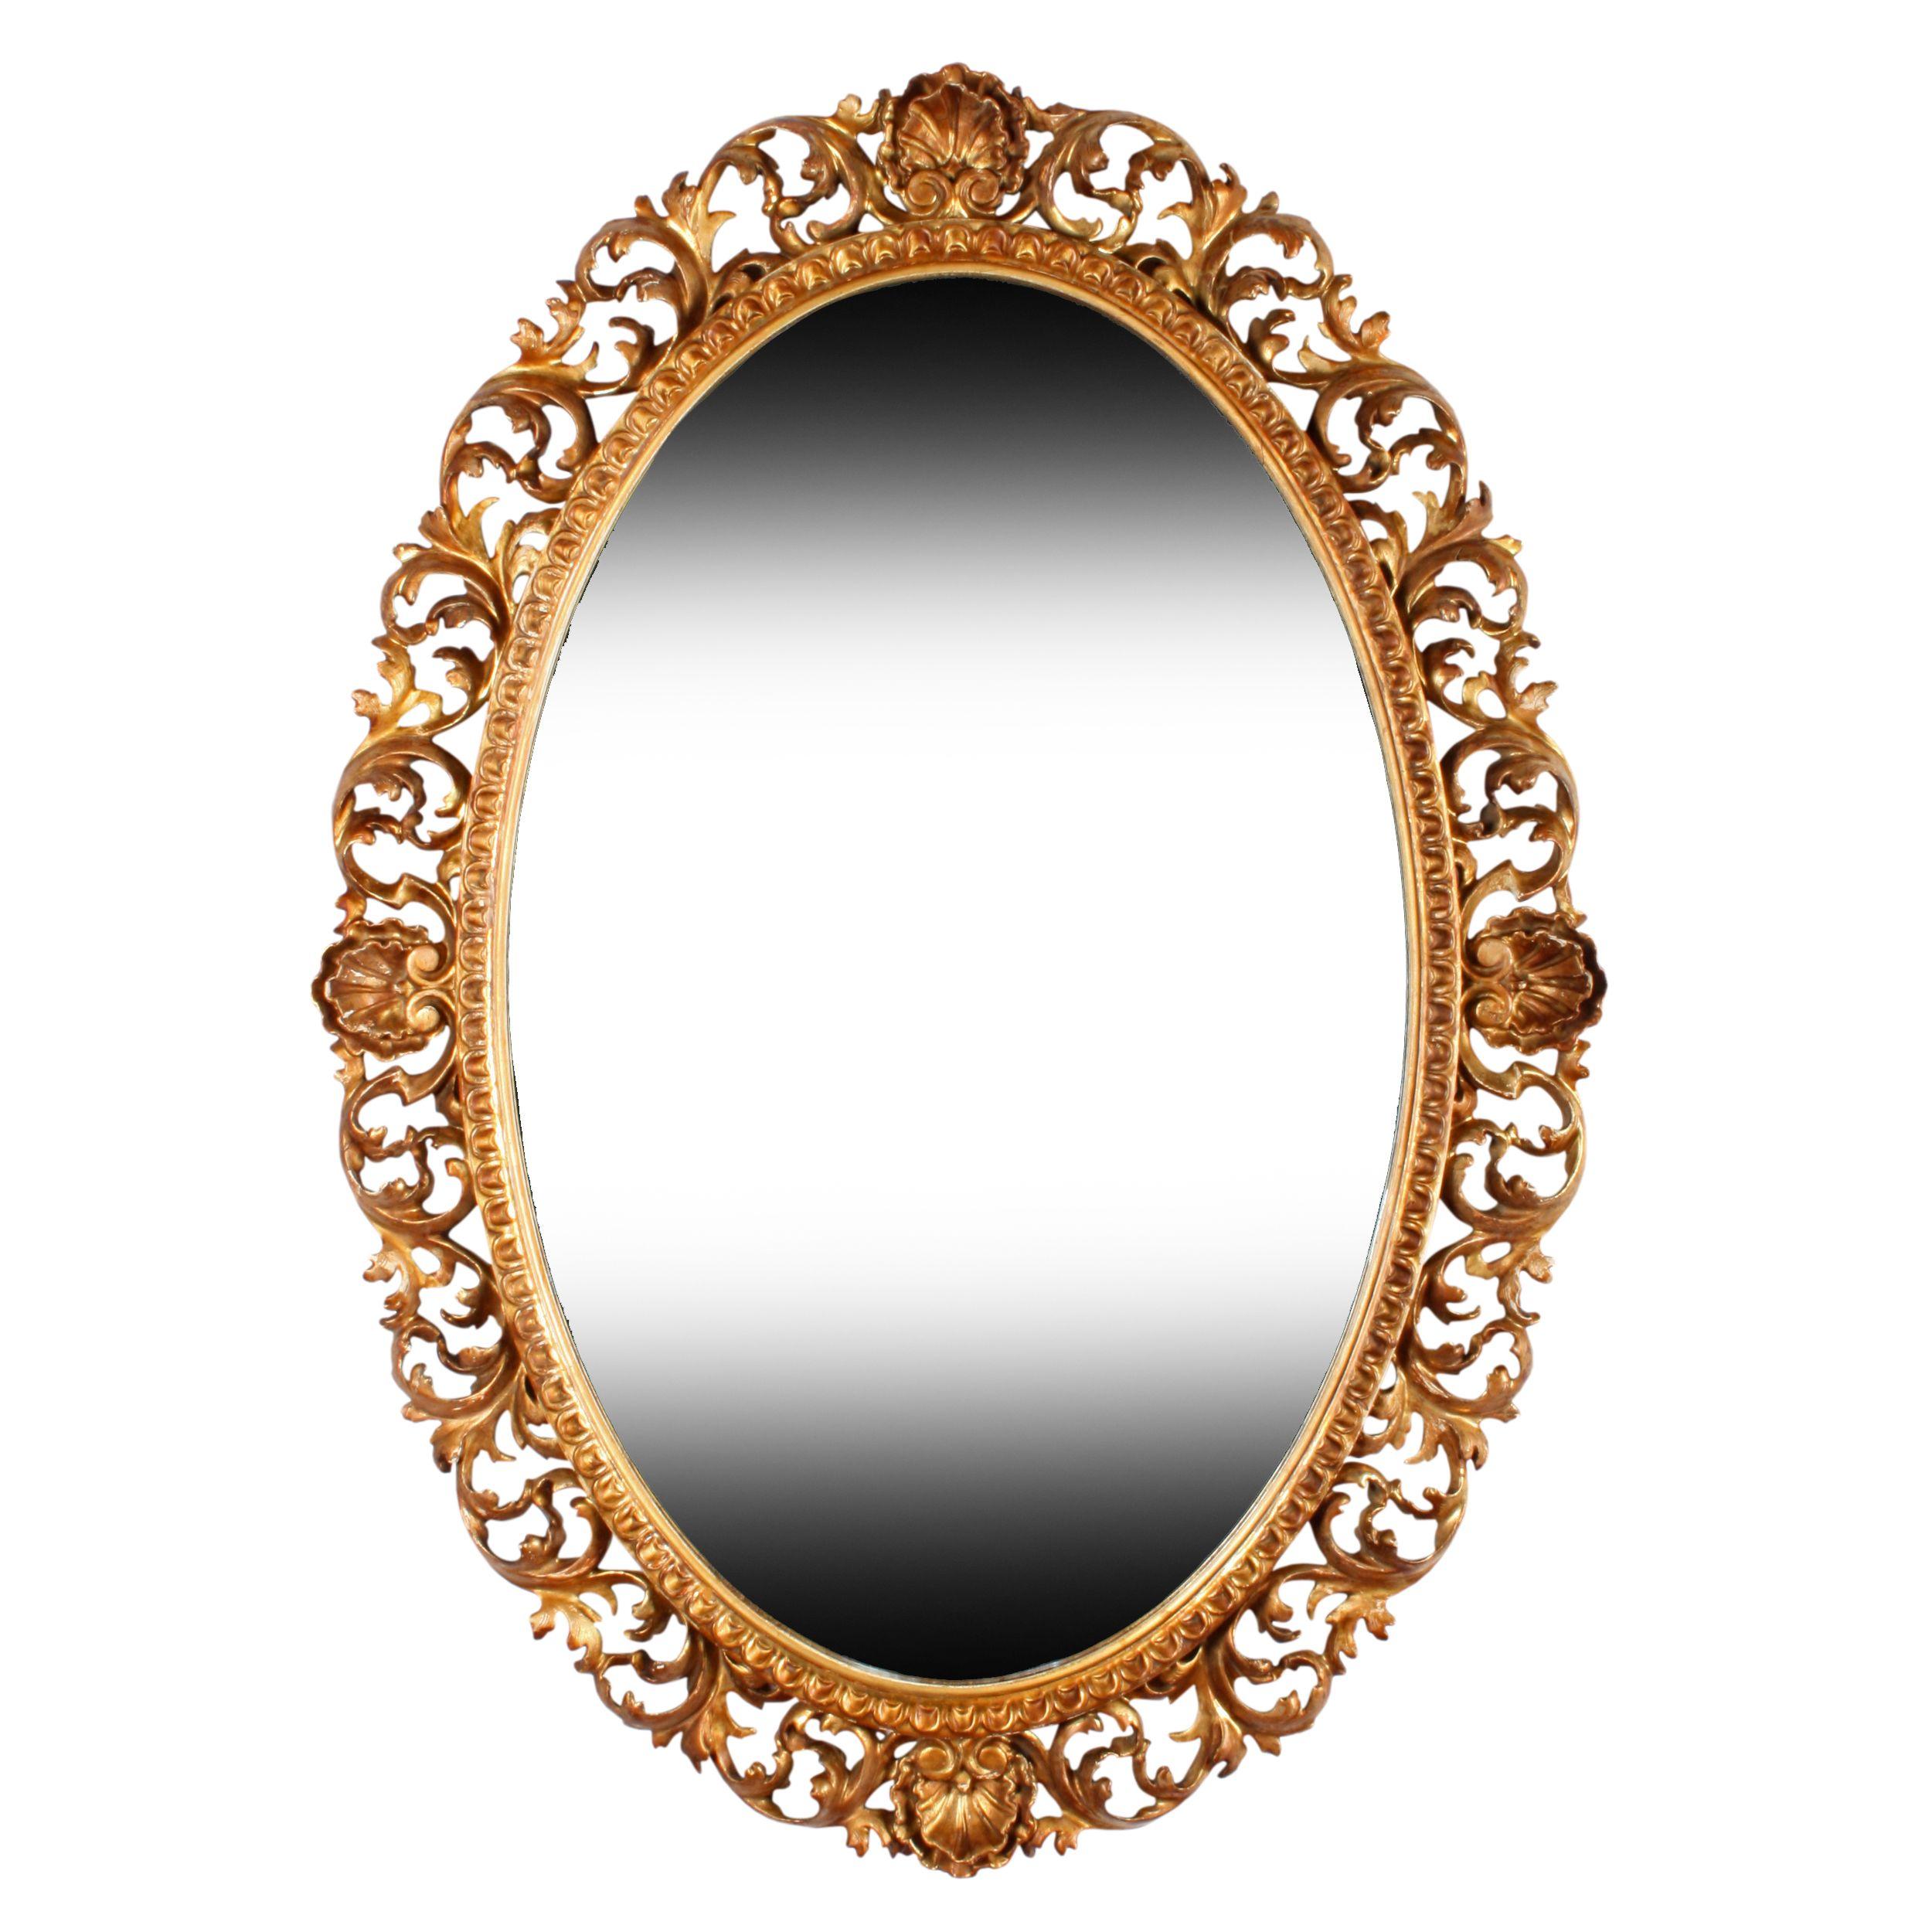 Florentine Dining Room: Oval Florentine Gilt Wood Mirror